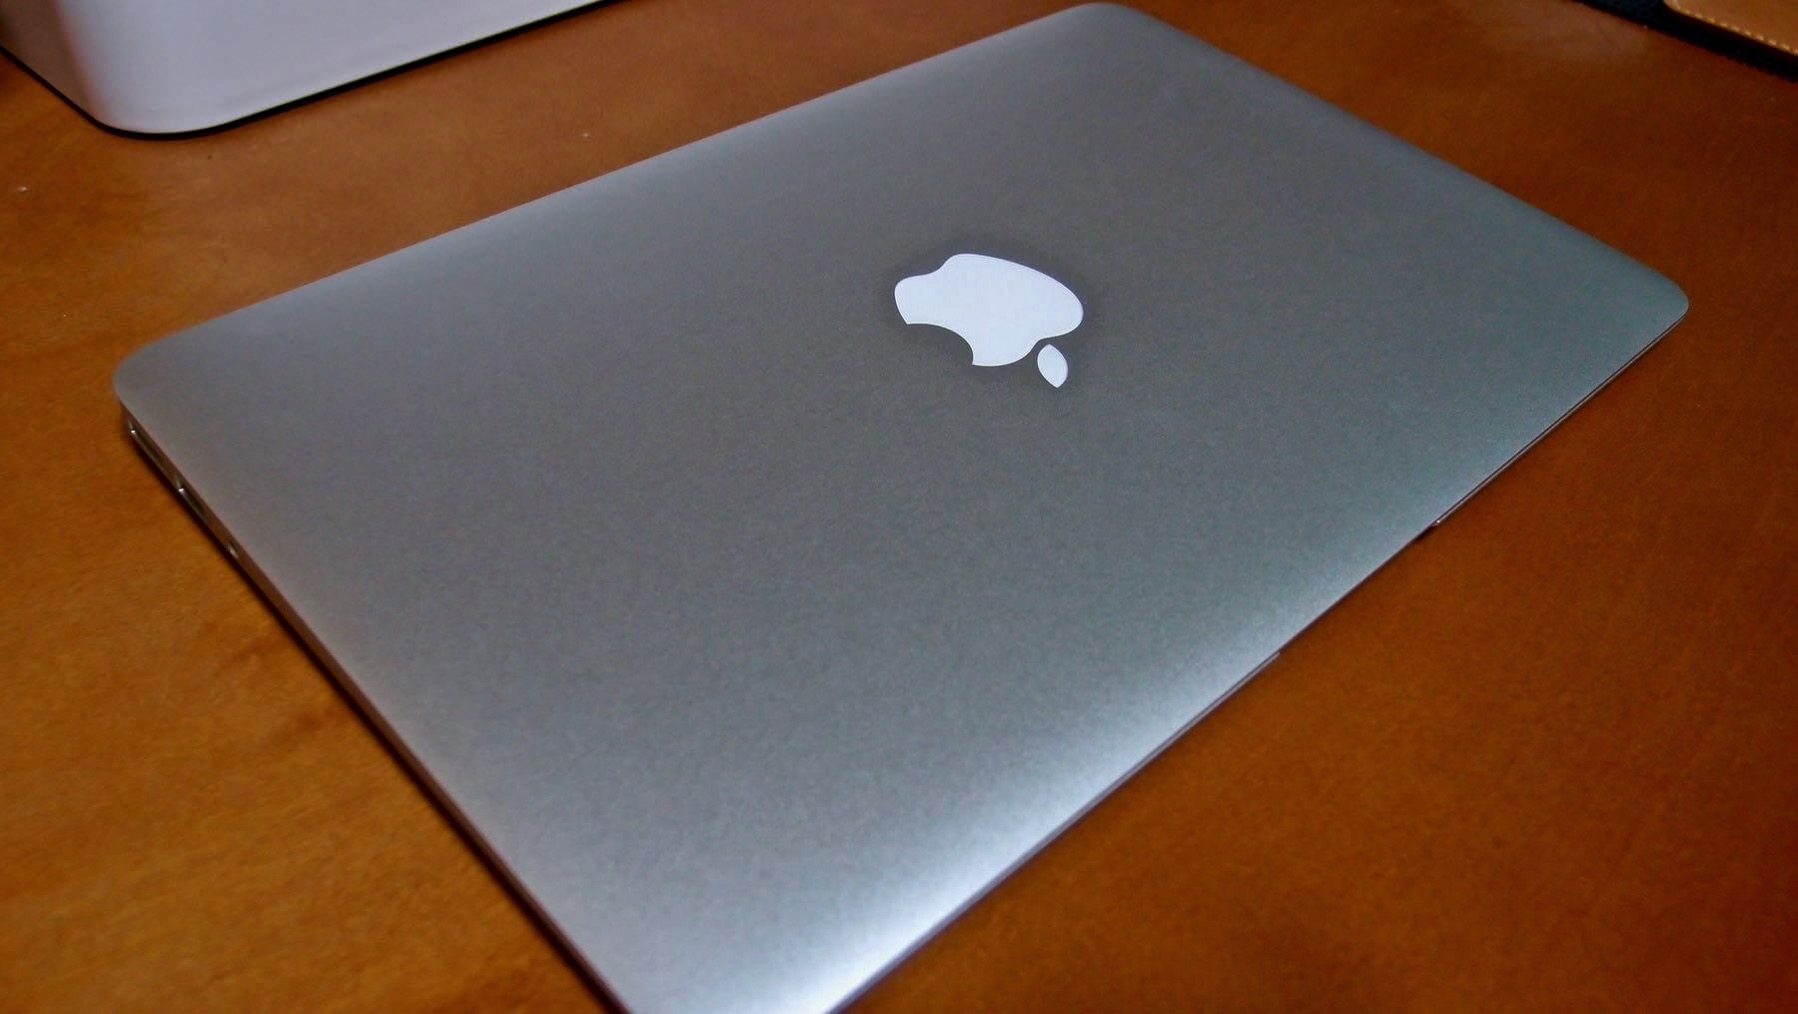 03 MacBook Air2013 Mid 11inch